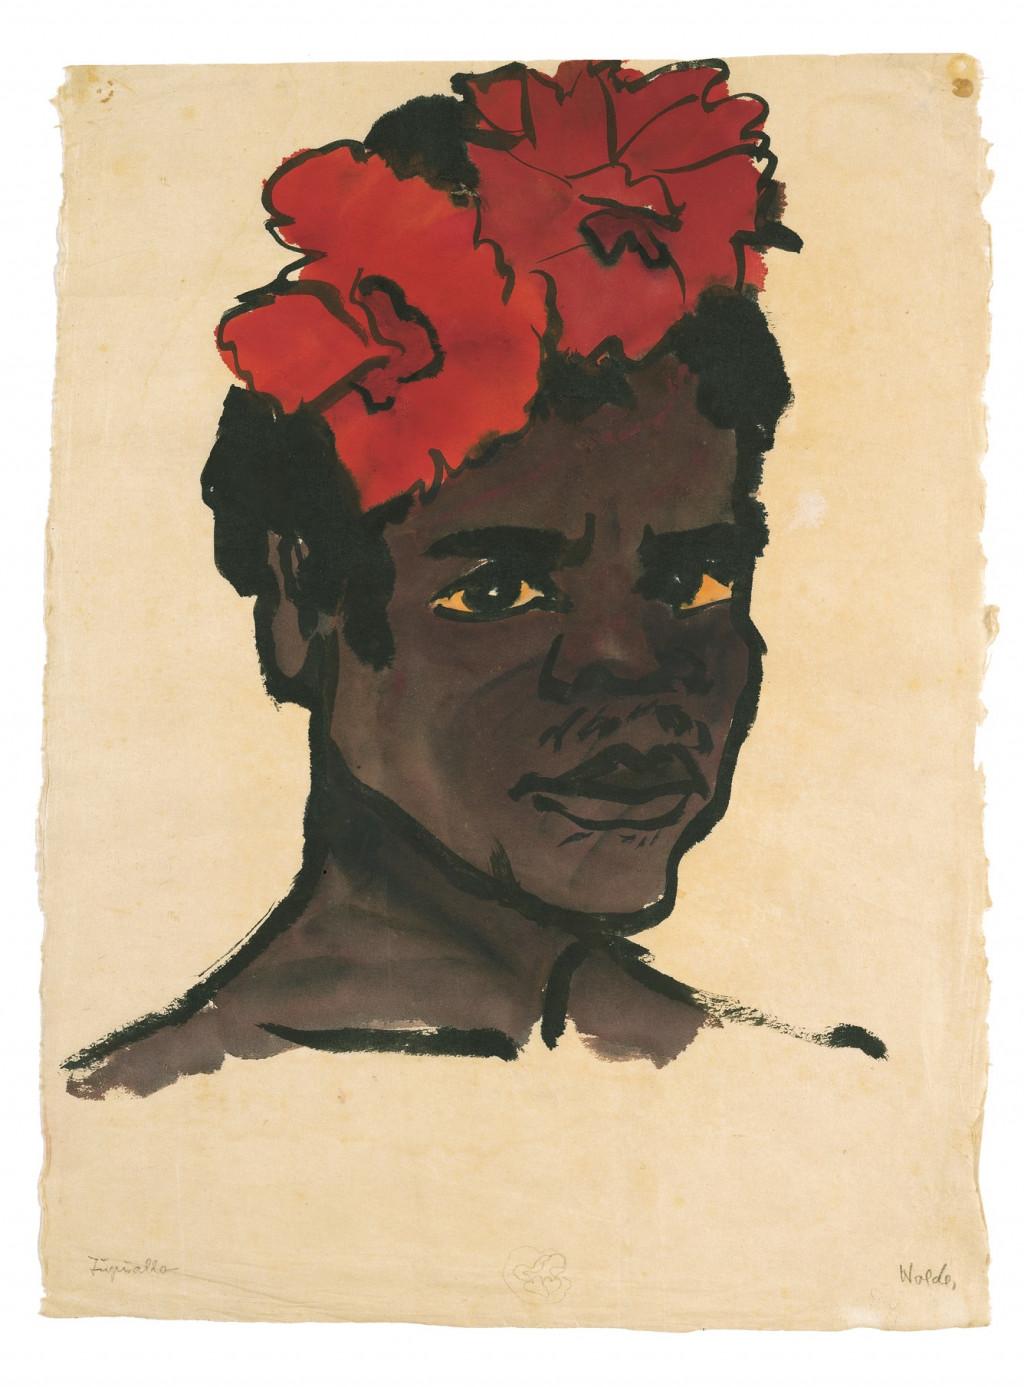 Emil Nolde, Jupuallo, 1913-1914, aquarel en Oost-Indische inkt op papier, 47,4 x 34,9 cm. Nolde Stiftung Seebüll © Nolde Stiftung Seebüll